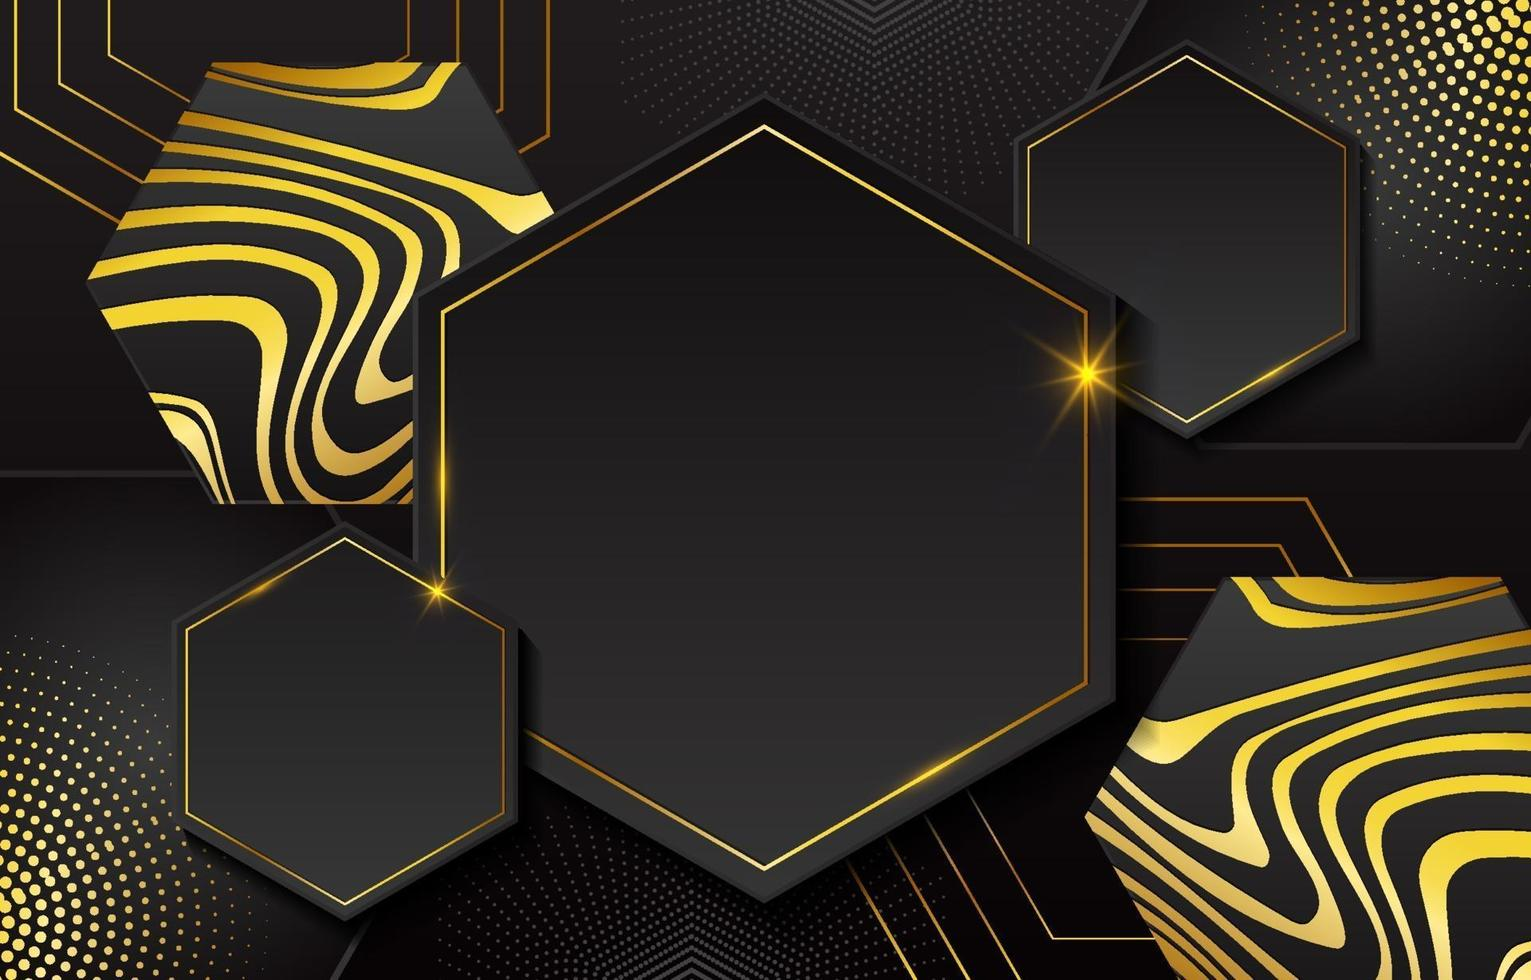 svart guld geometrisk bakgrund vektor